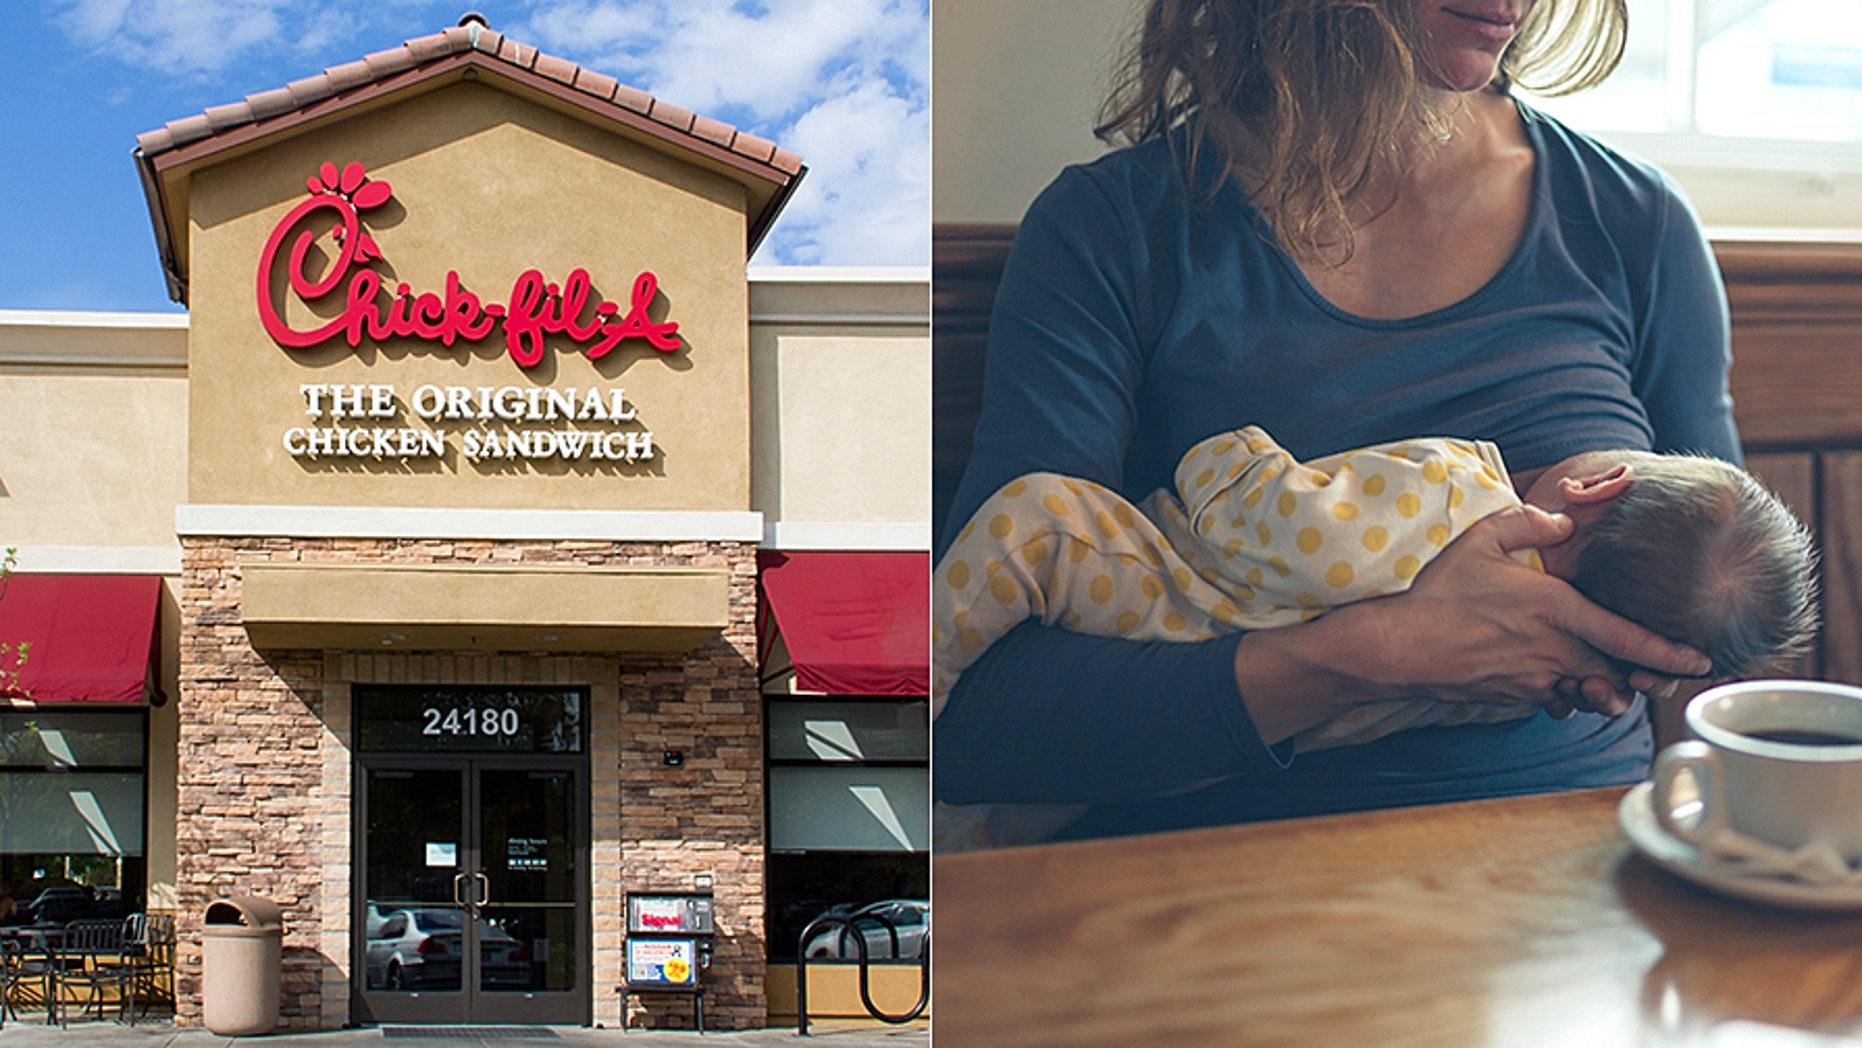 North Dakota law allows women to breastfeed in public since 2009.